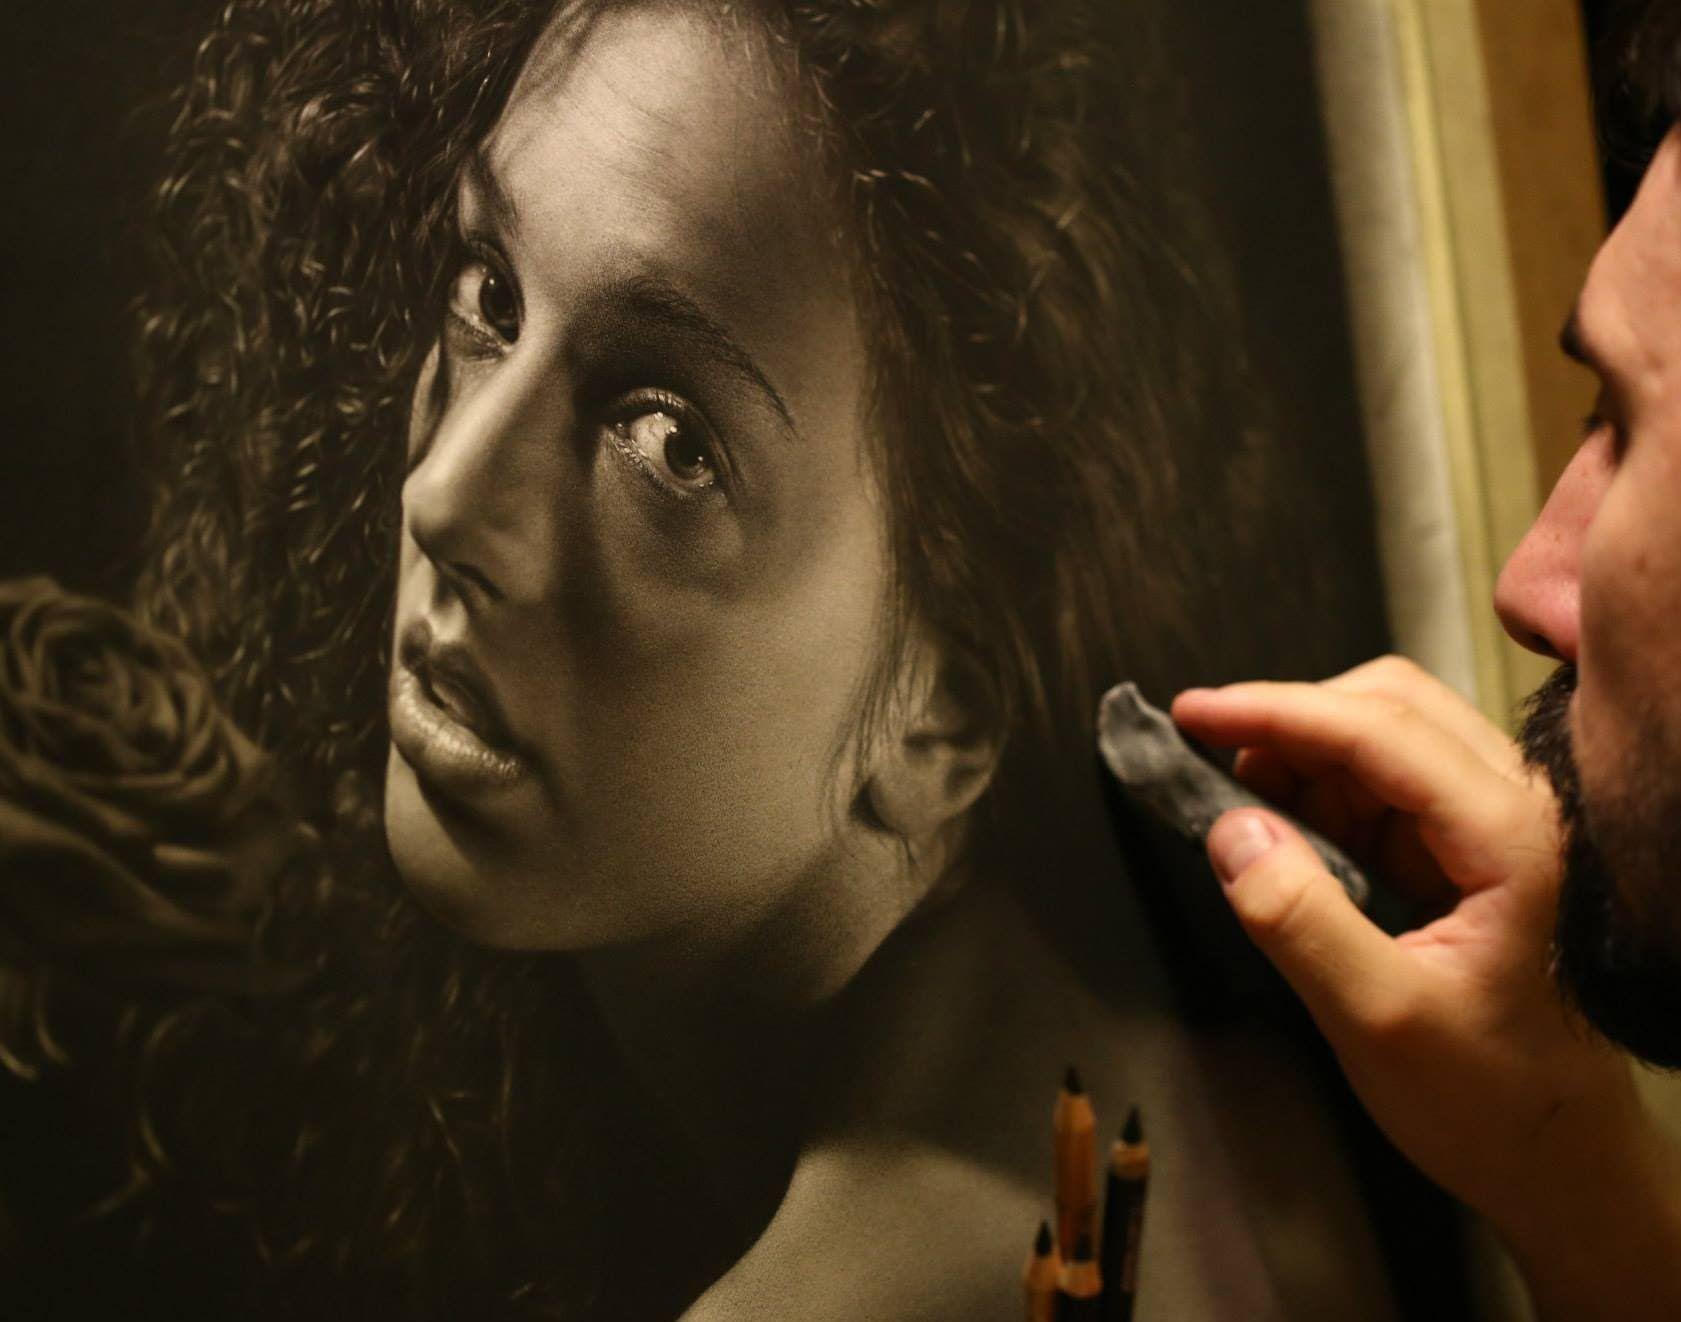 Emanuele Daskanio – slikar čije slike je teško razlikovati od fotografije - Page 2 7d985fe93a0f217ae1315d313ef93ec4